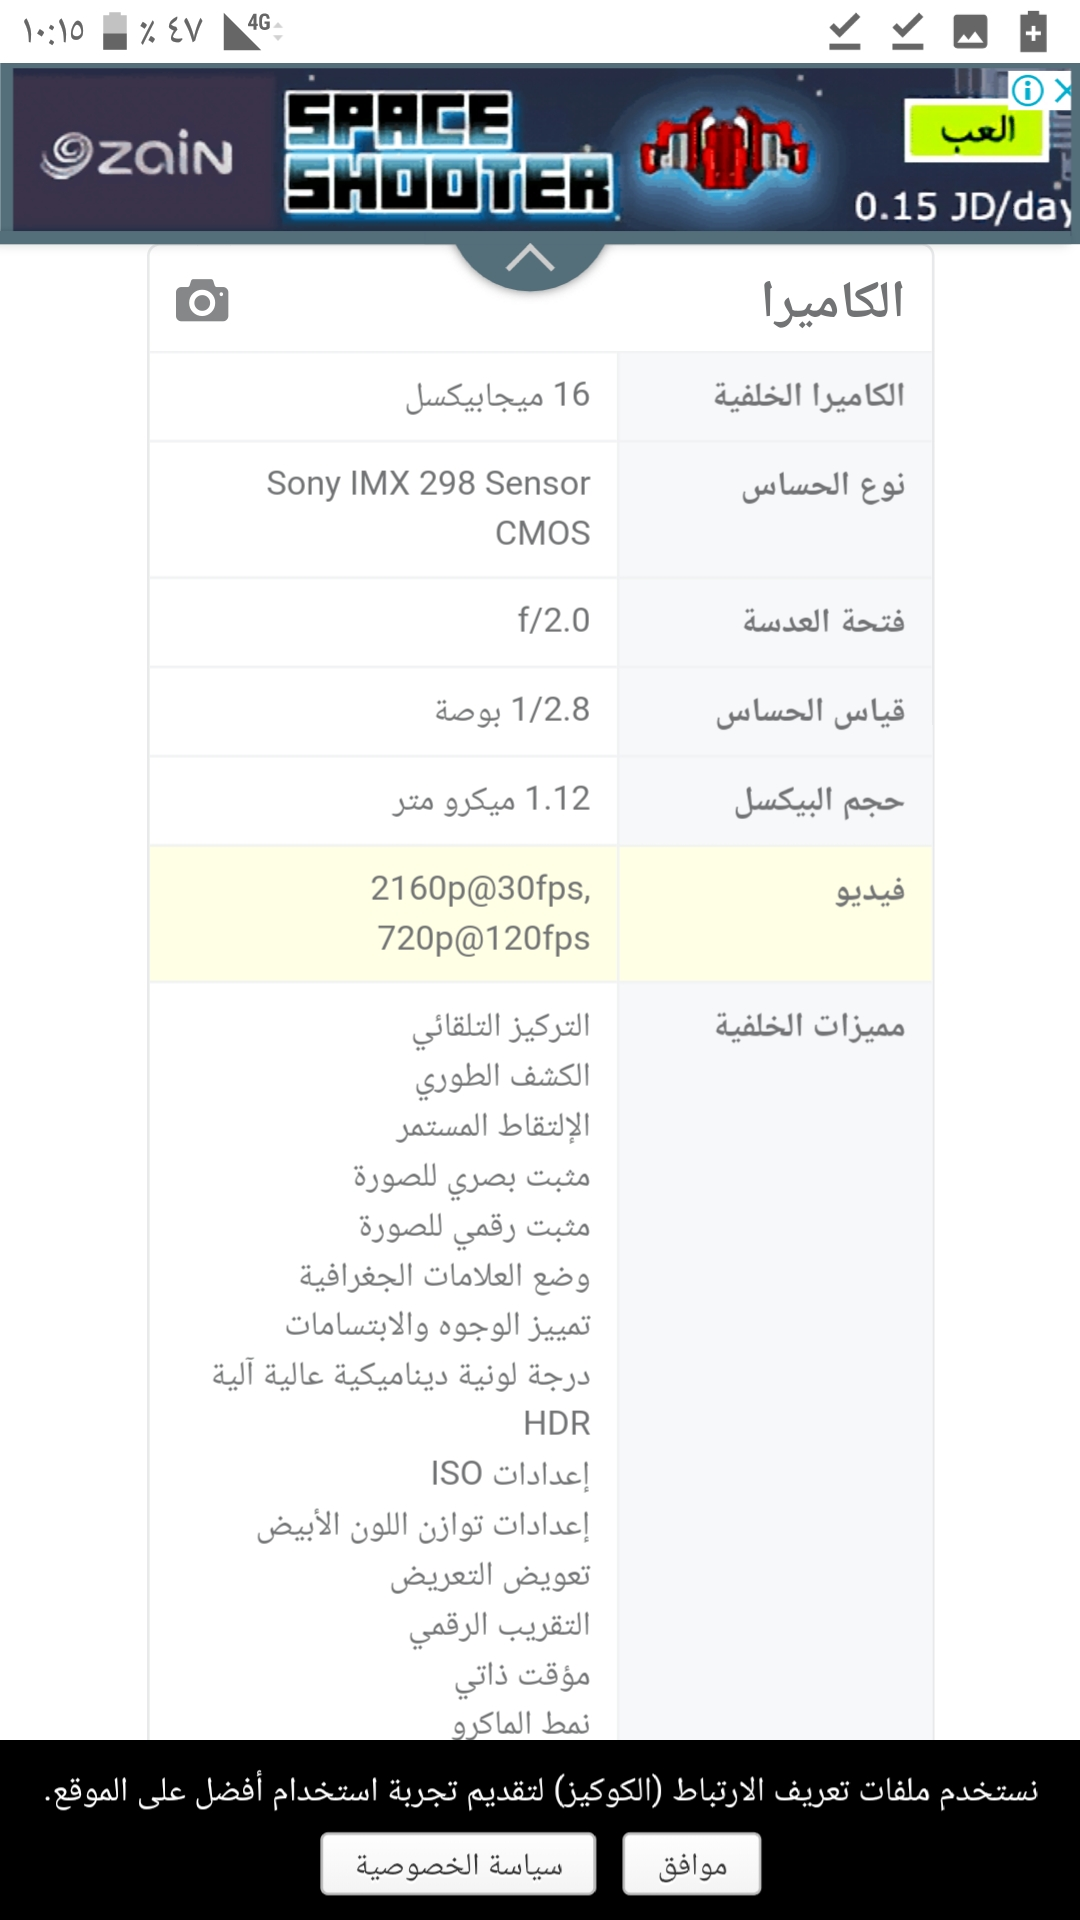 Apple iPhone 7 Plus 128GB( Free iWatch ) Free Shipping Delivery - Dhl , Fedex $350New OriginalApple iPhone 7+ Plus 128GB GSM Unlocked,Sim-Free warranty - Apple -  oneplus 3t رام 6جيجا لا...